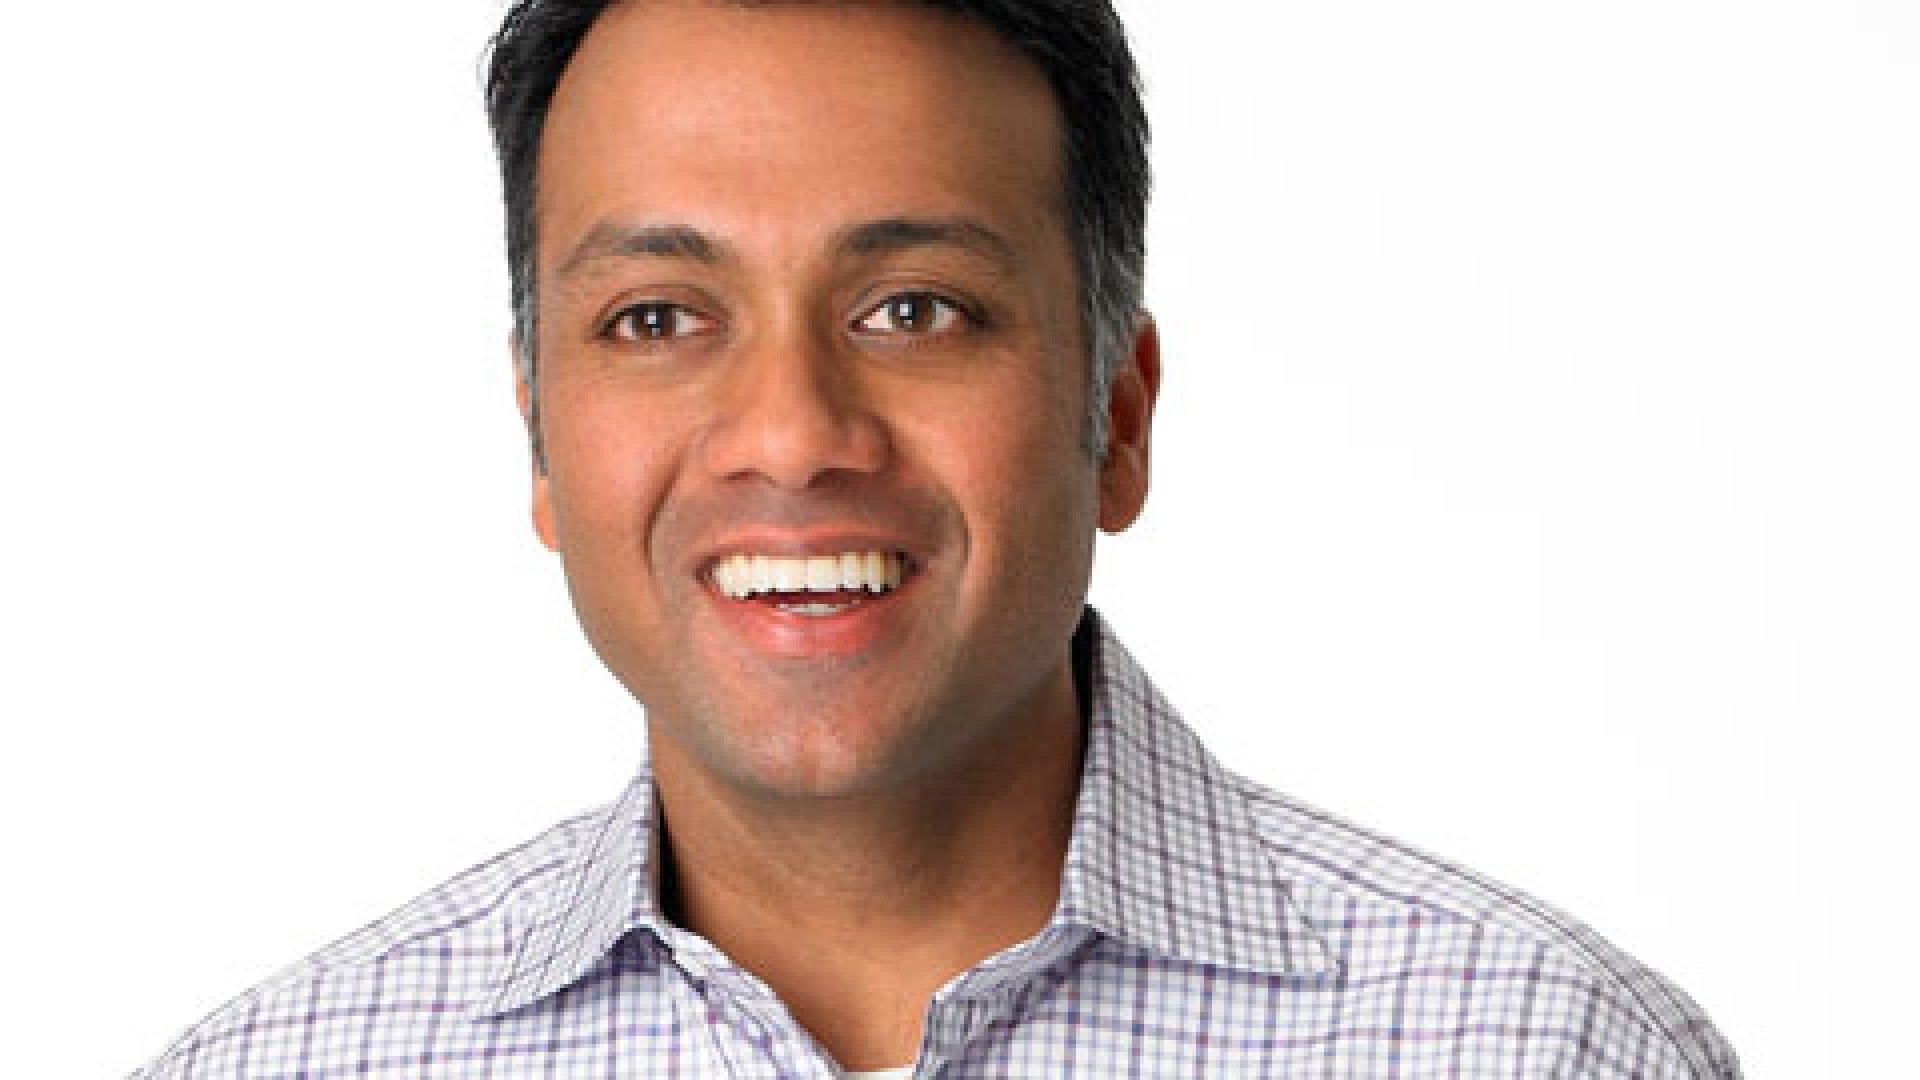 Bain Capital Managing Director Ajay Agarwal